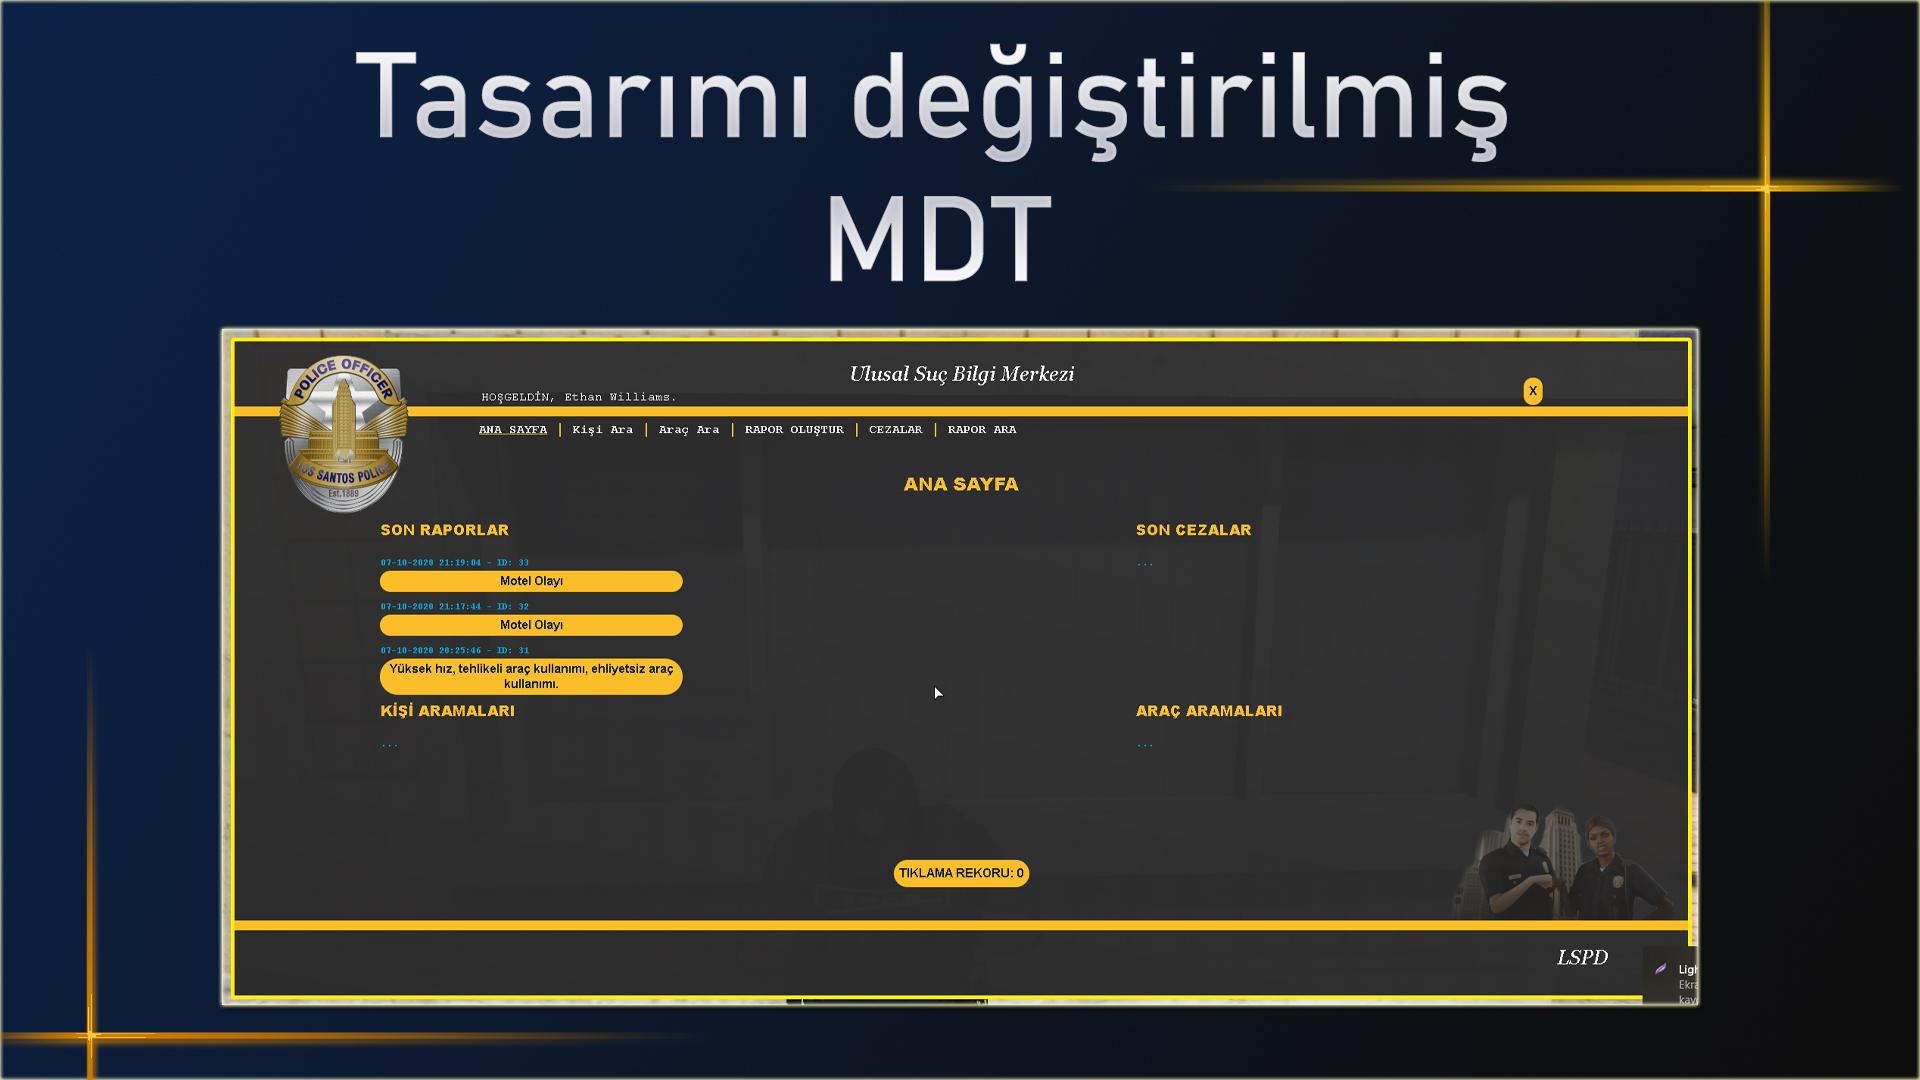 [Resim: MDT.jpg]